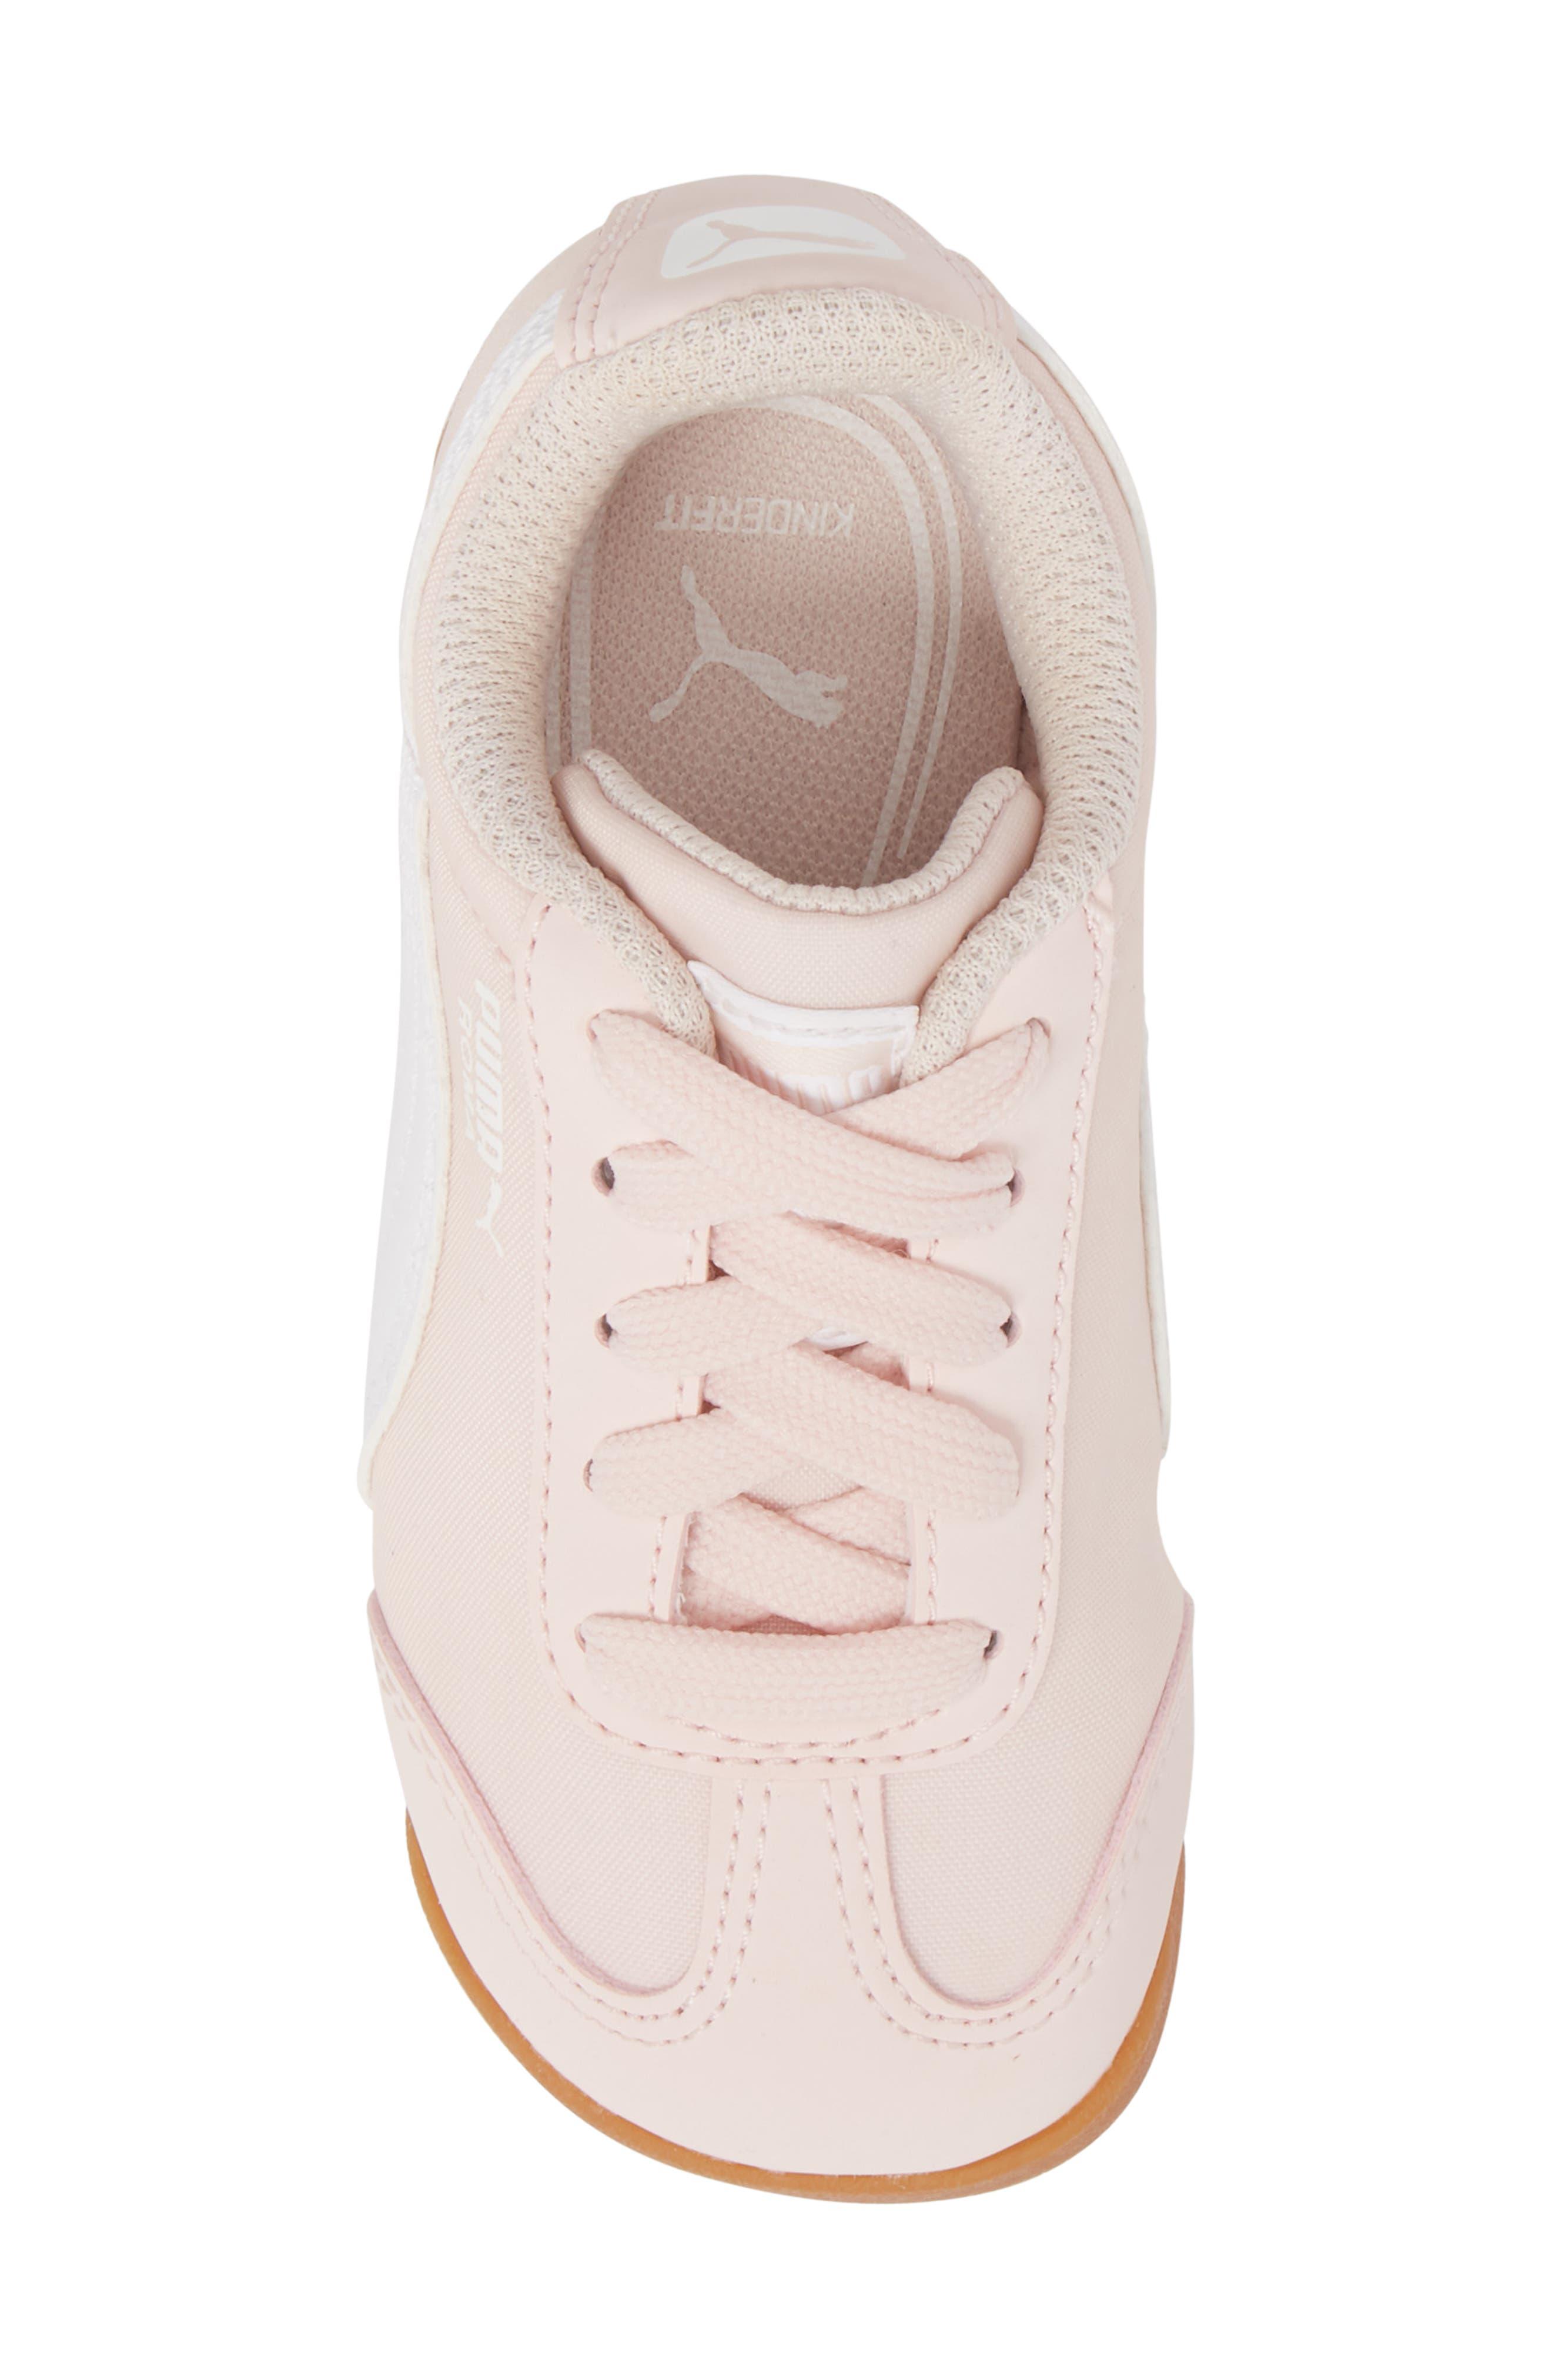 PUMA,                             Roma Basic Summer Sneaker,                             Alternate thumbnail 5, color,                             100